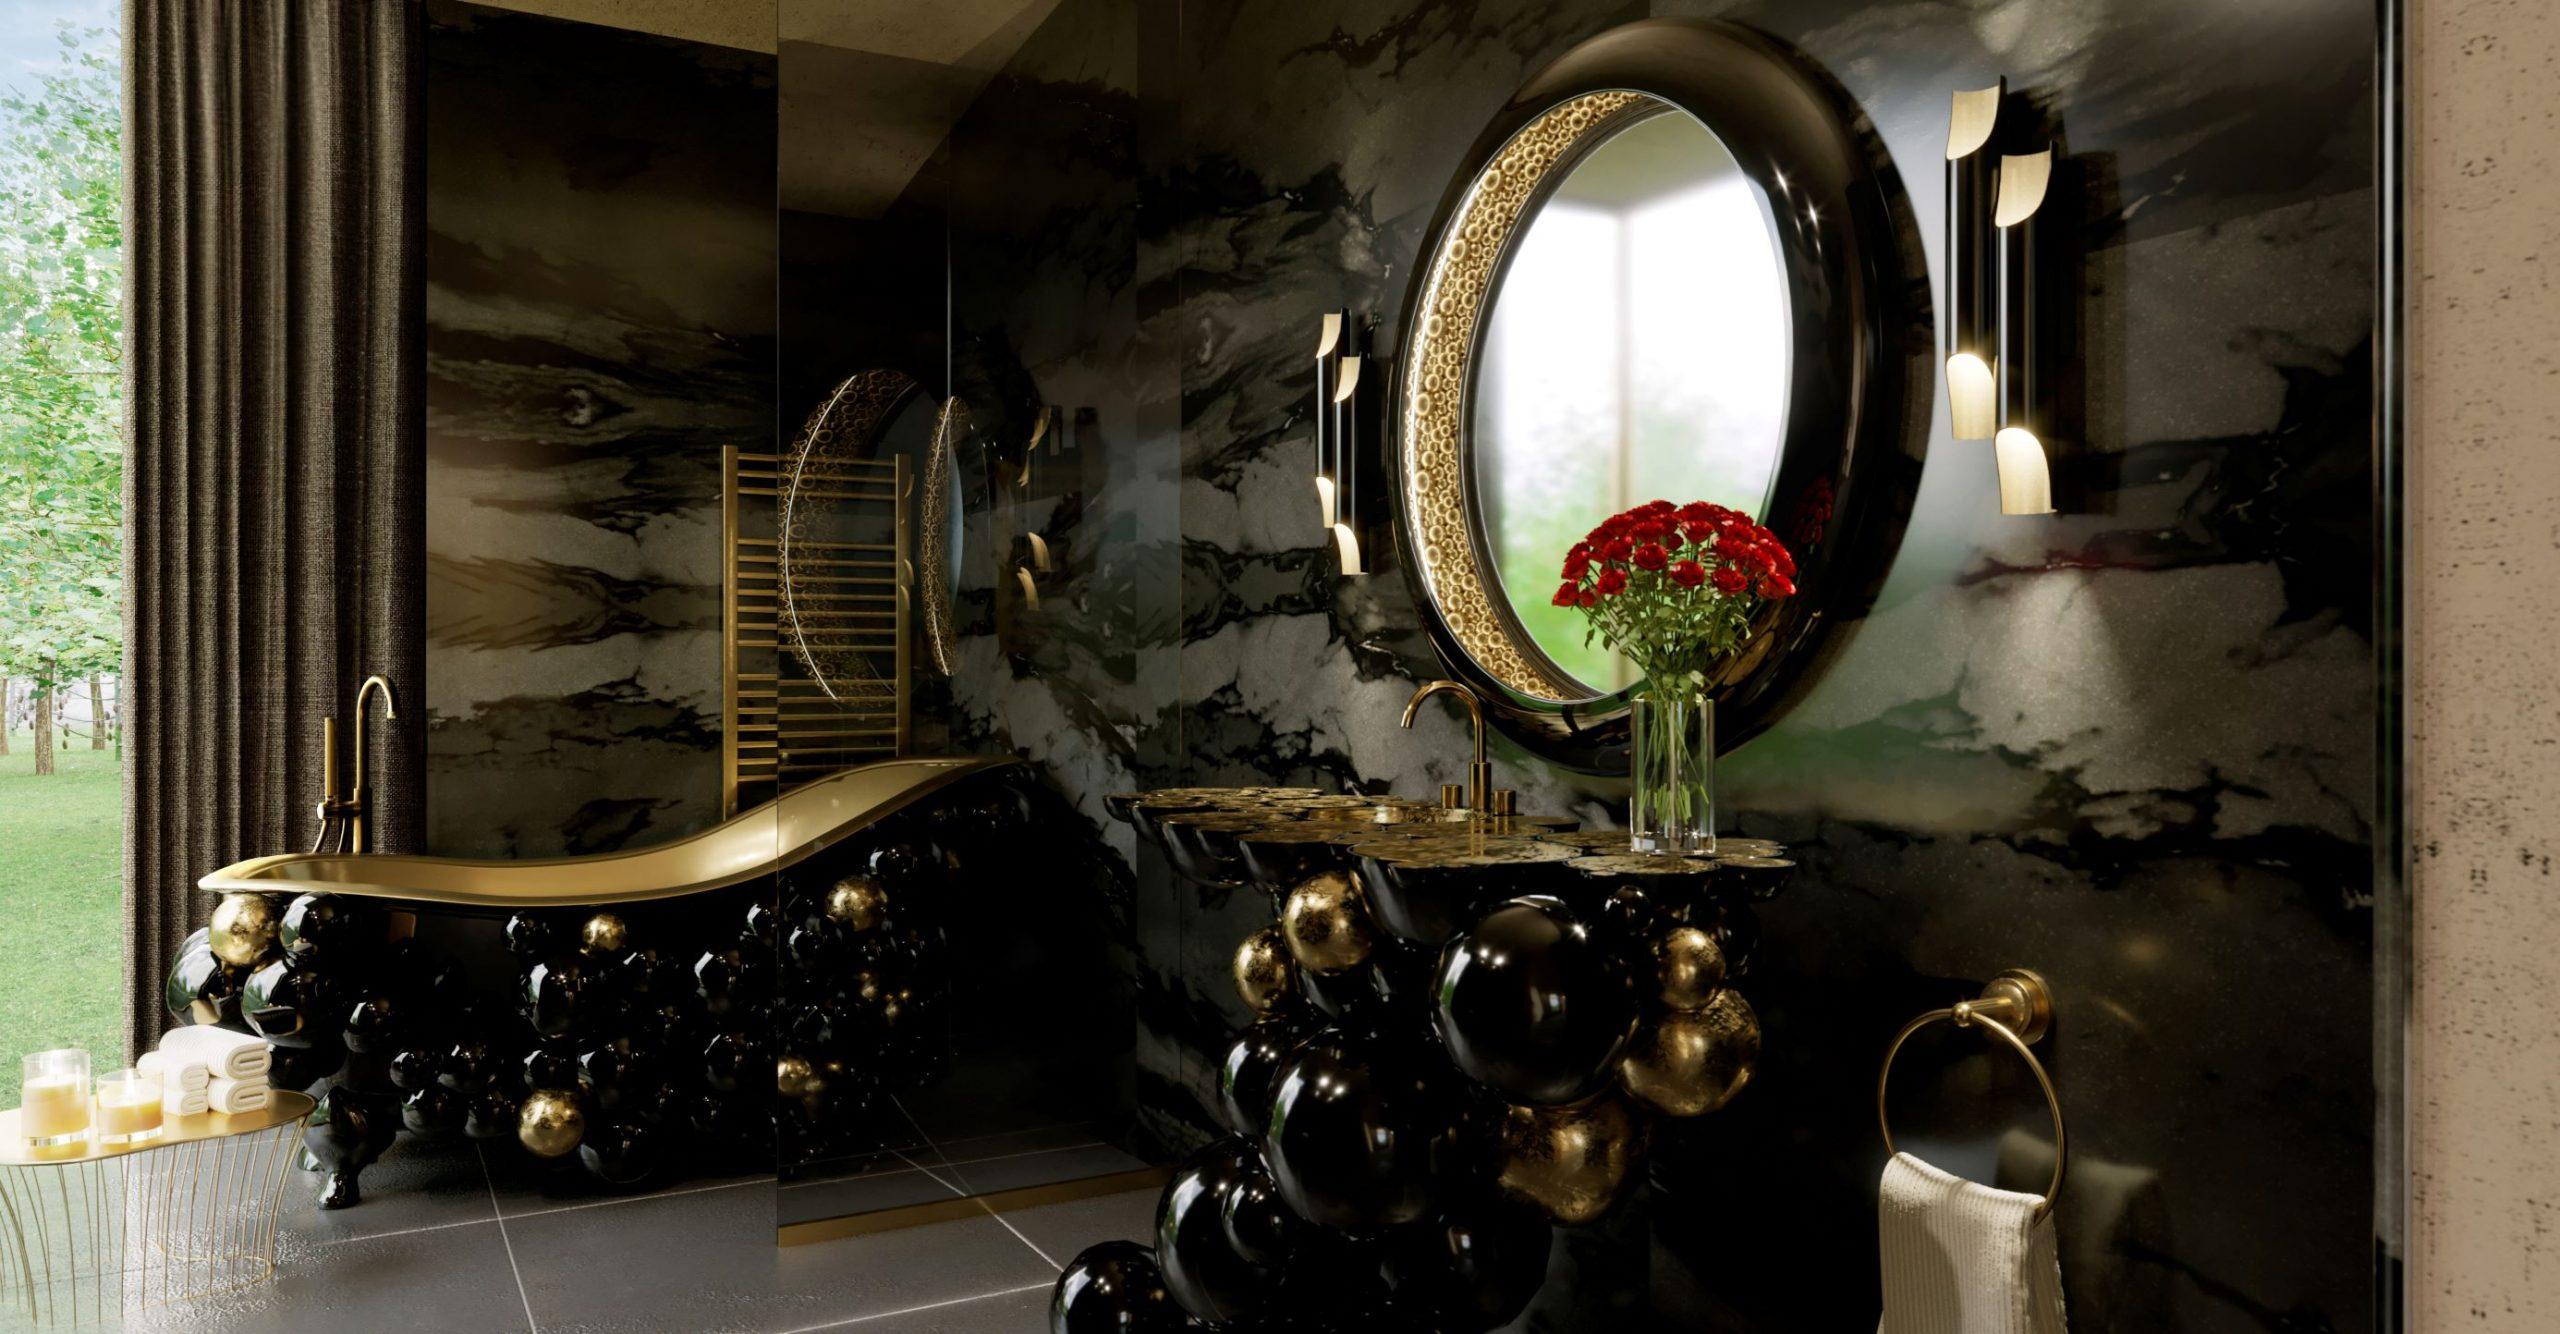 Newton Bathroom - Interior Design Ideas For Your Bathroom home inspiration ideas